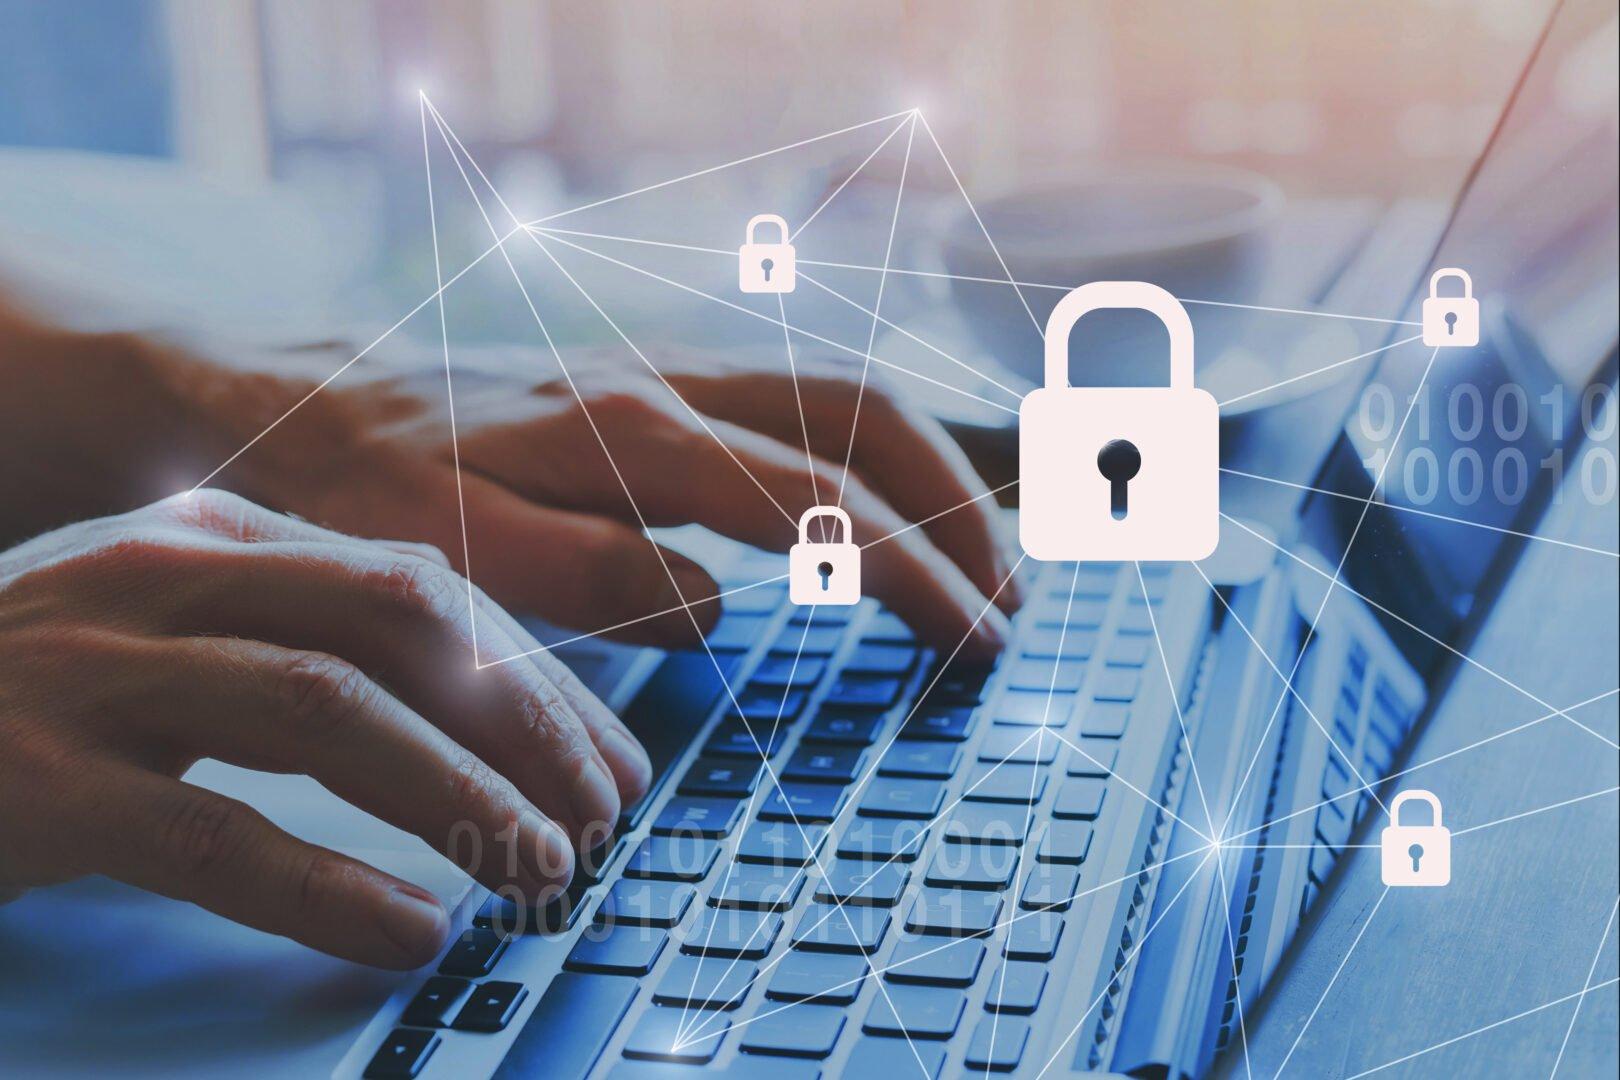 internet security lock access